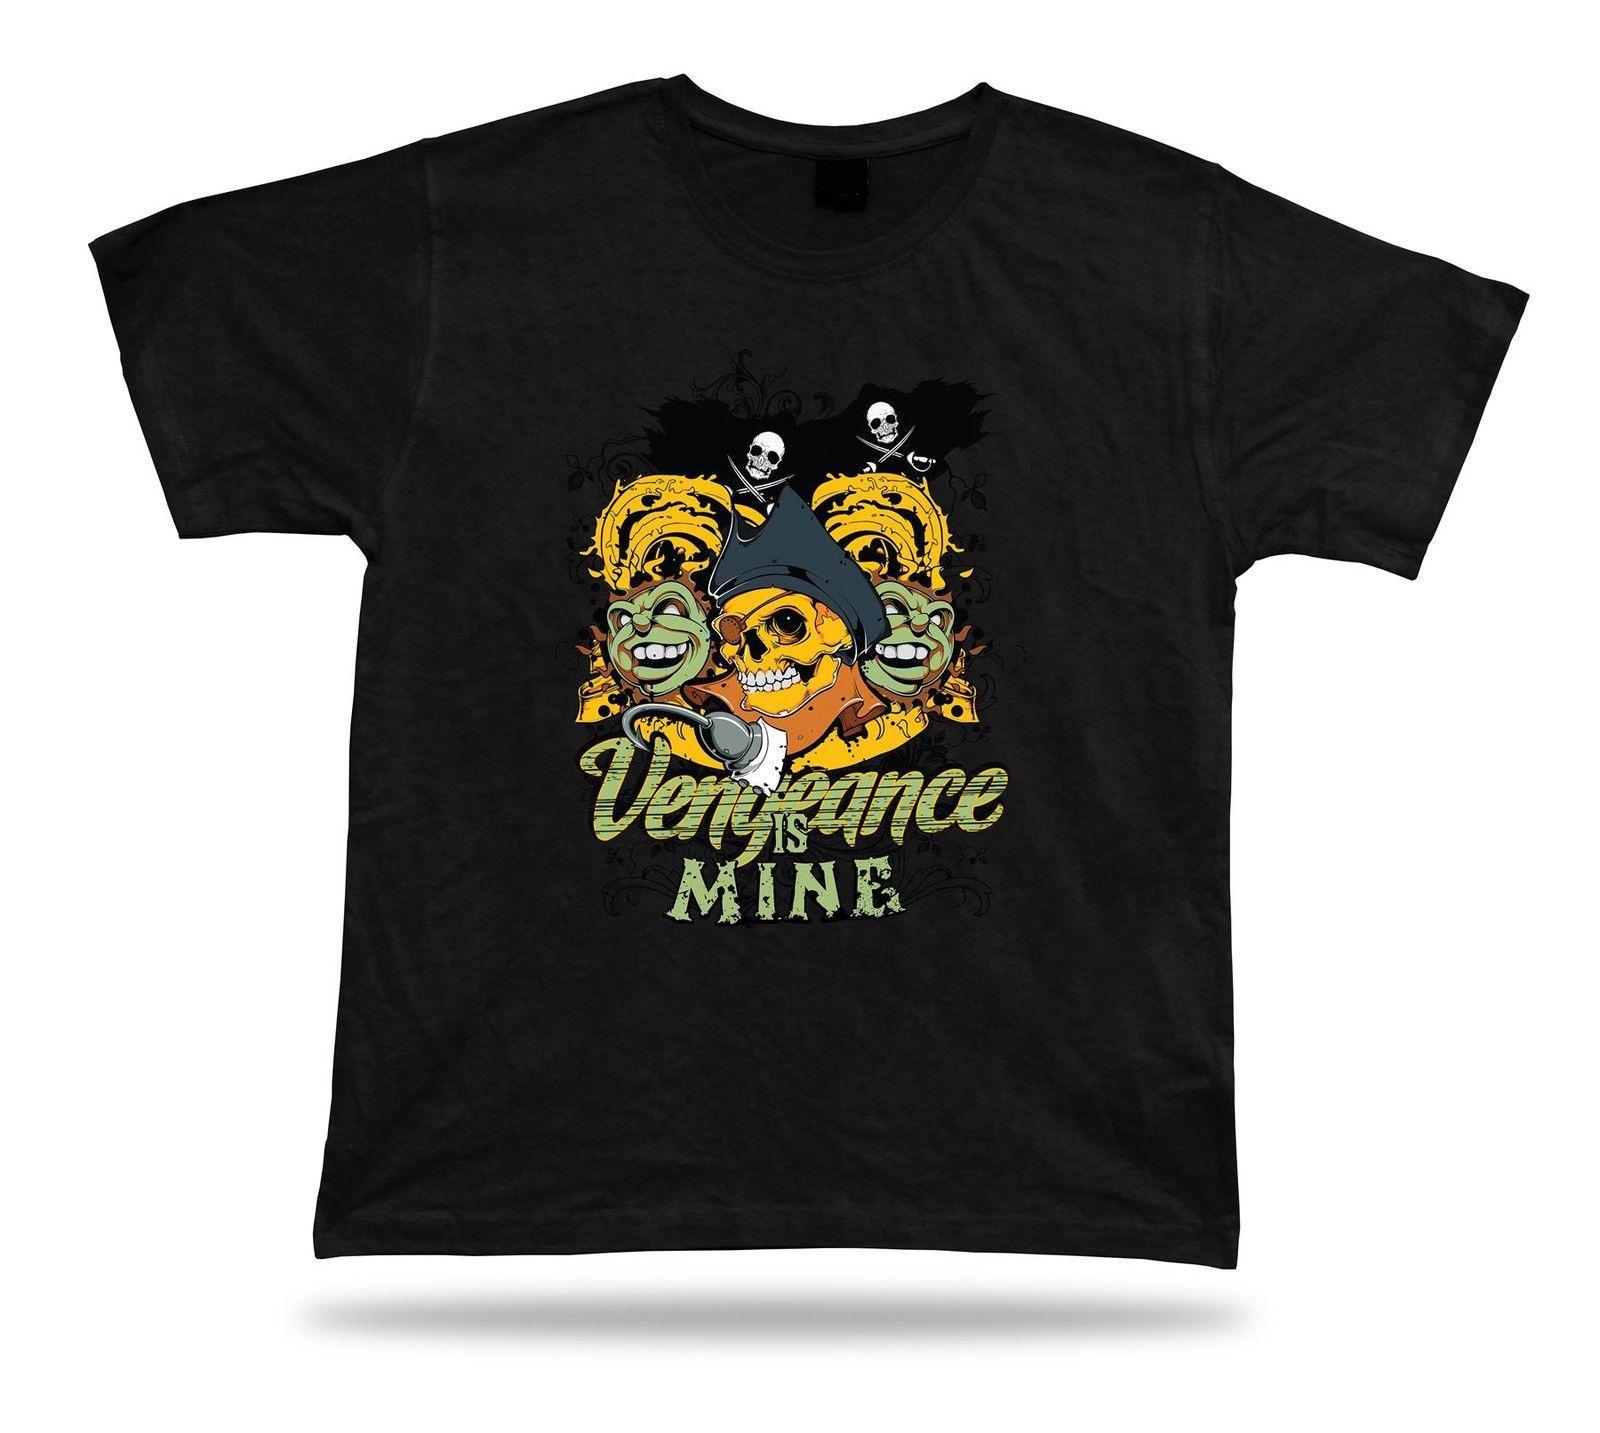 Tshirt Tee Shirt Birthday Gift Idea Pirate World Skull Ship Vengeance Treasure Online With 1854 Piece On Moviethirts Store